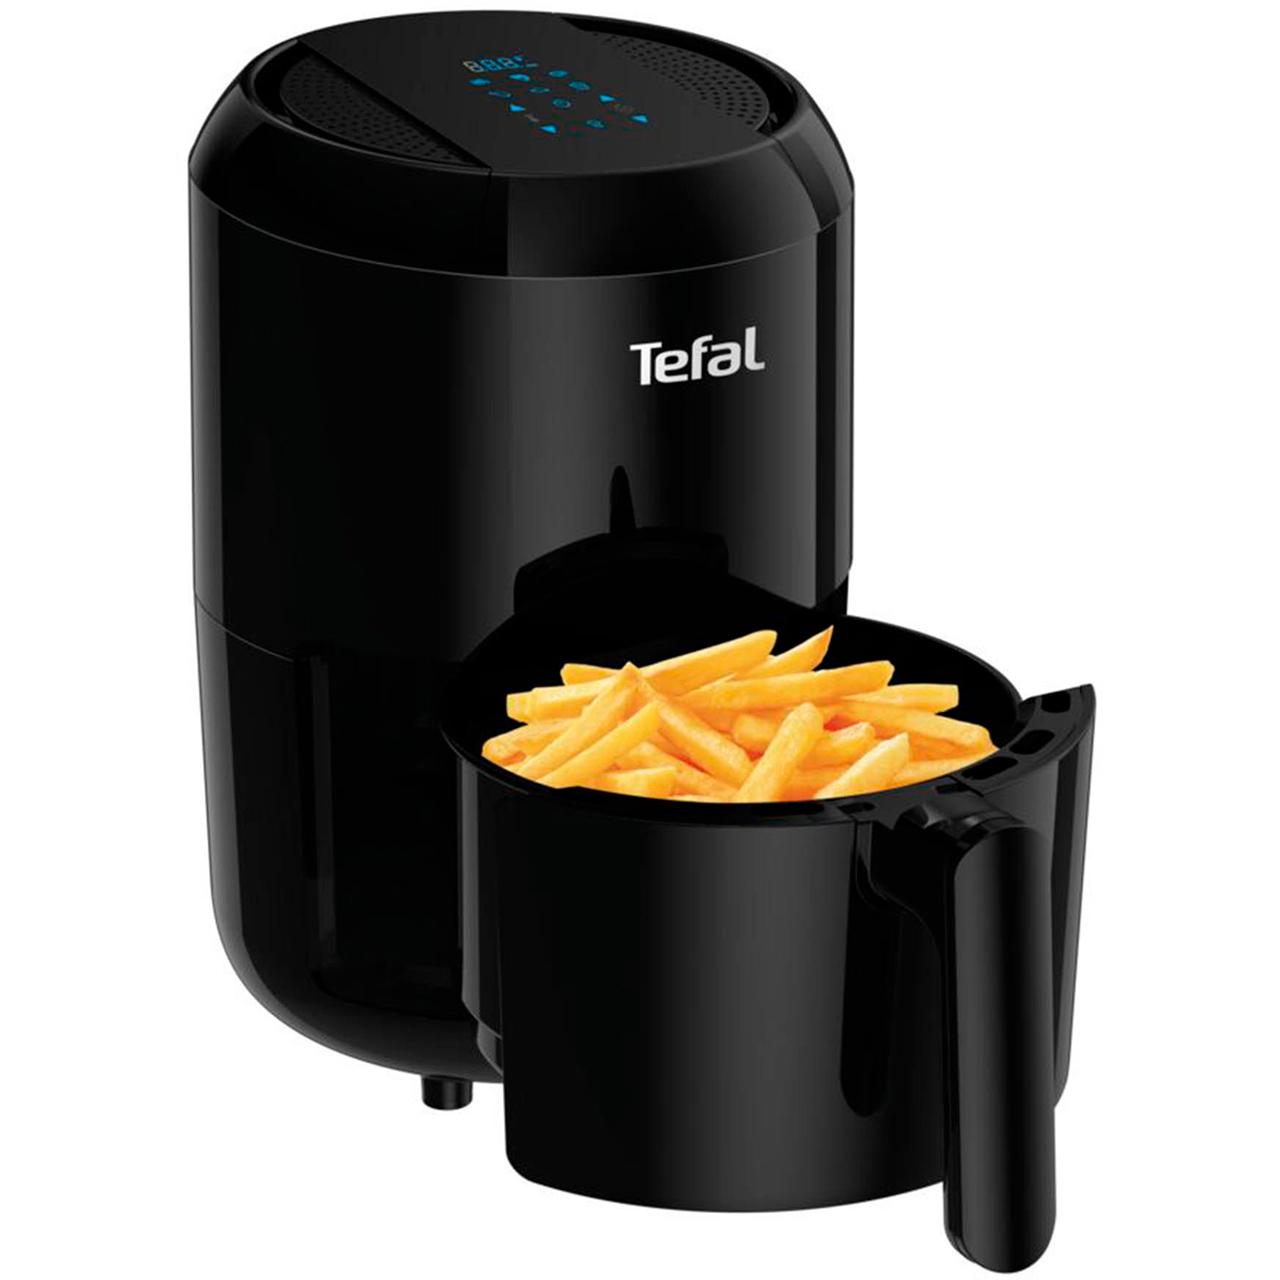 Tefal compact easy fryer £40 at Wilko